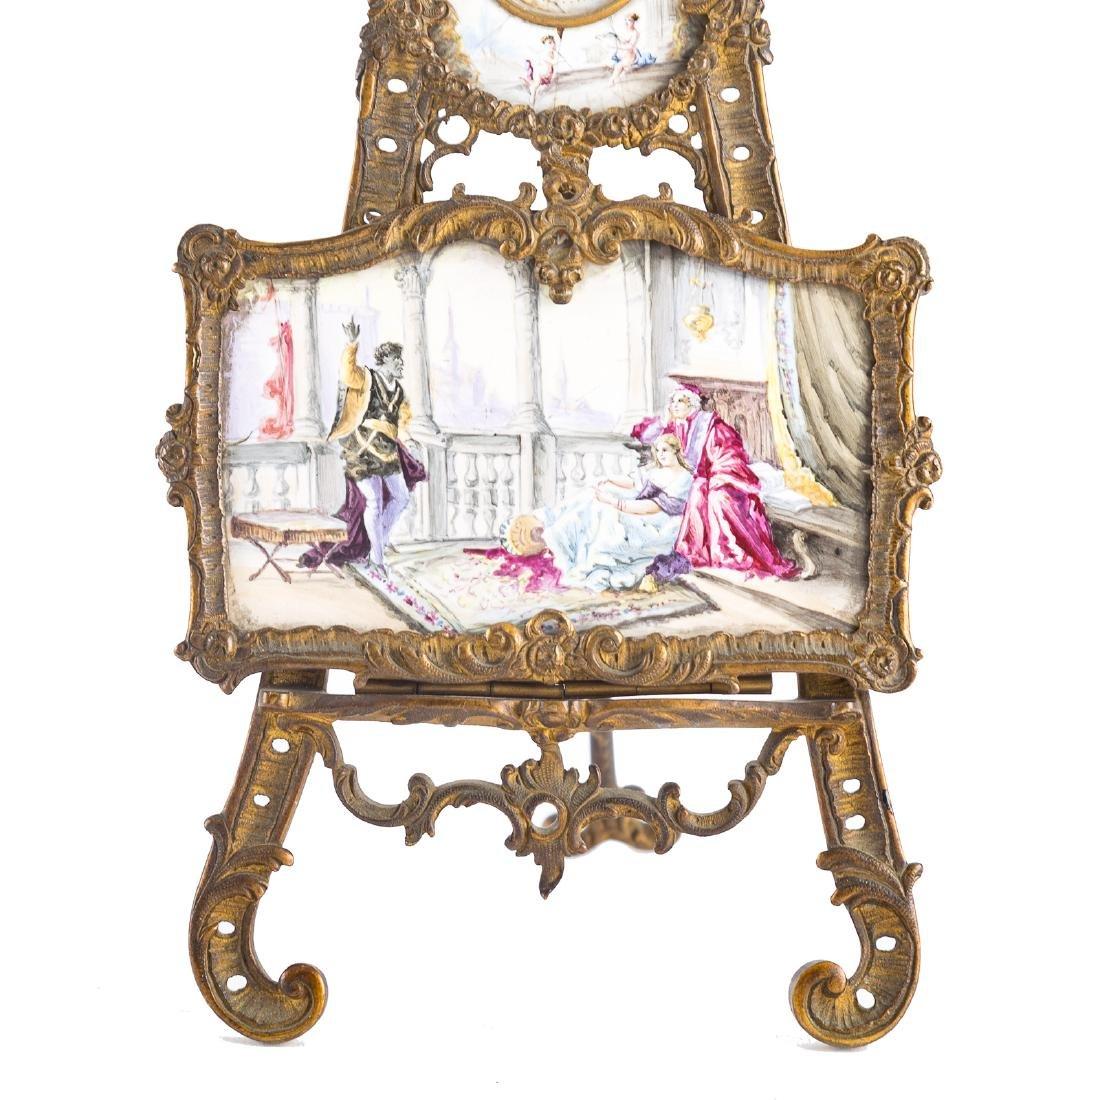 Rococo style gilt-metal desk clock - 3